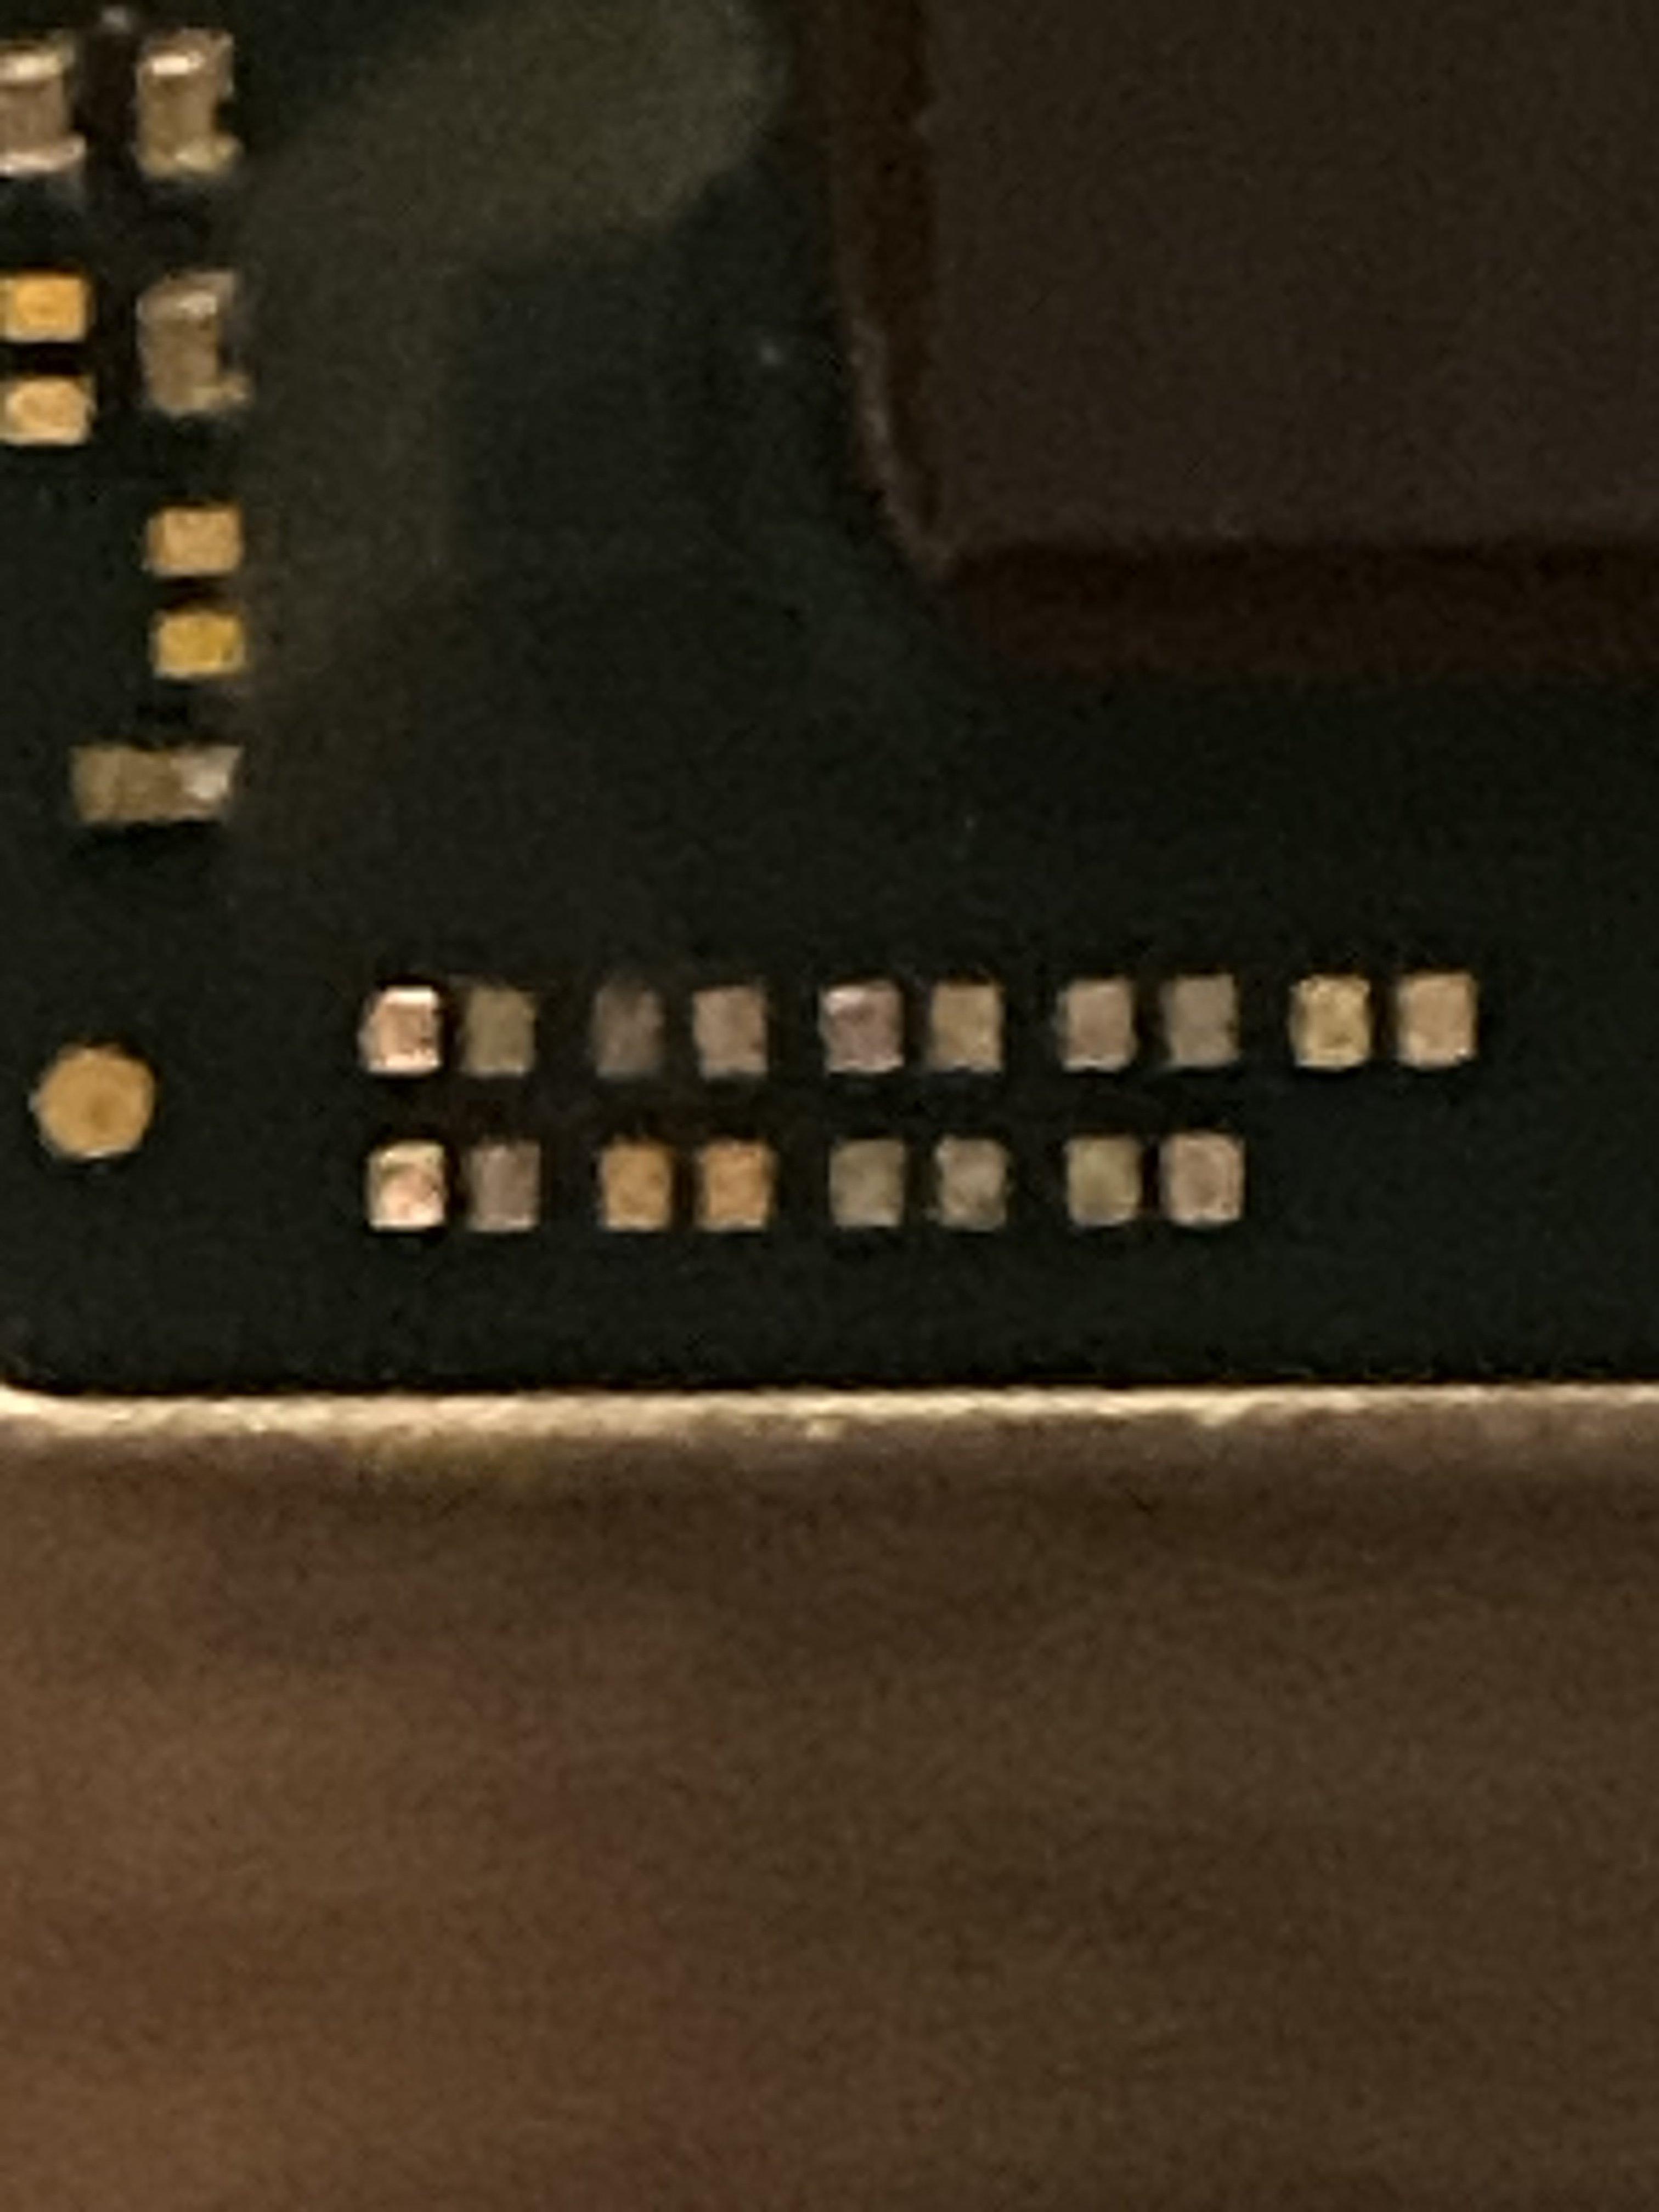 E3BC897D-7DFD-43A0-9DD0-6262E1EC99C4.jpeg